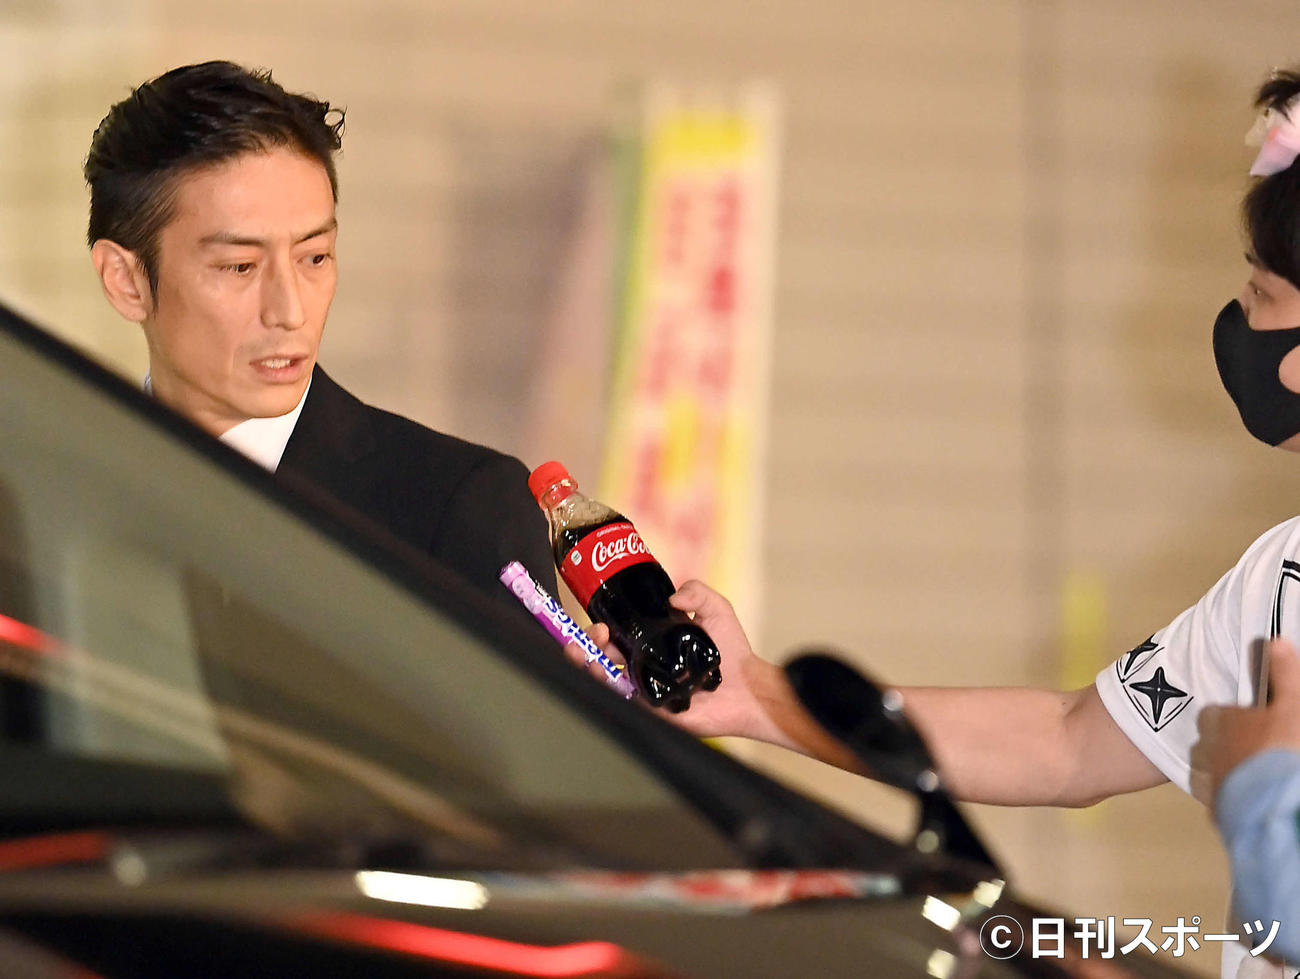 https://i1.wp.com/www.nikkansports.com/entertainment/news/img/202009300000905-w1300_1.jpg